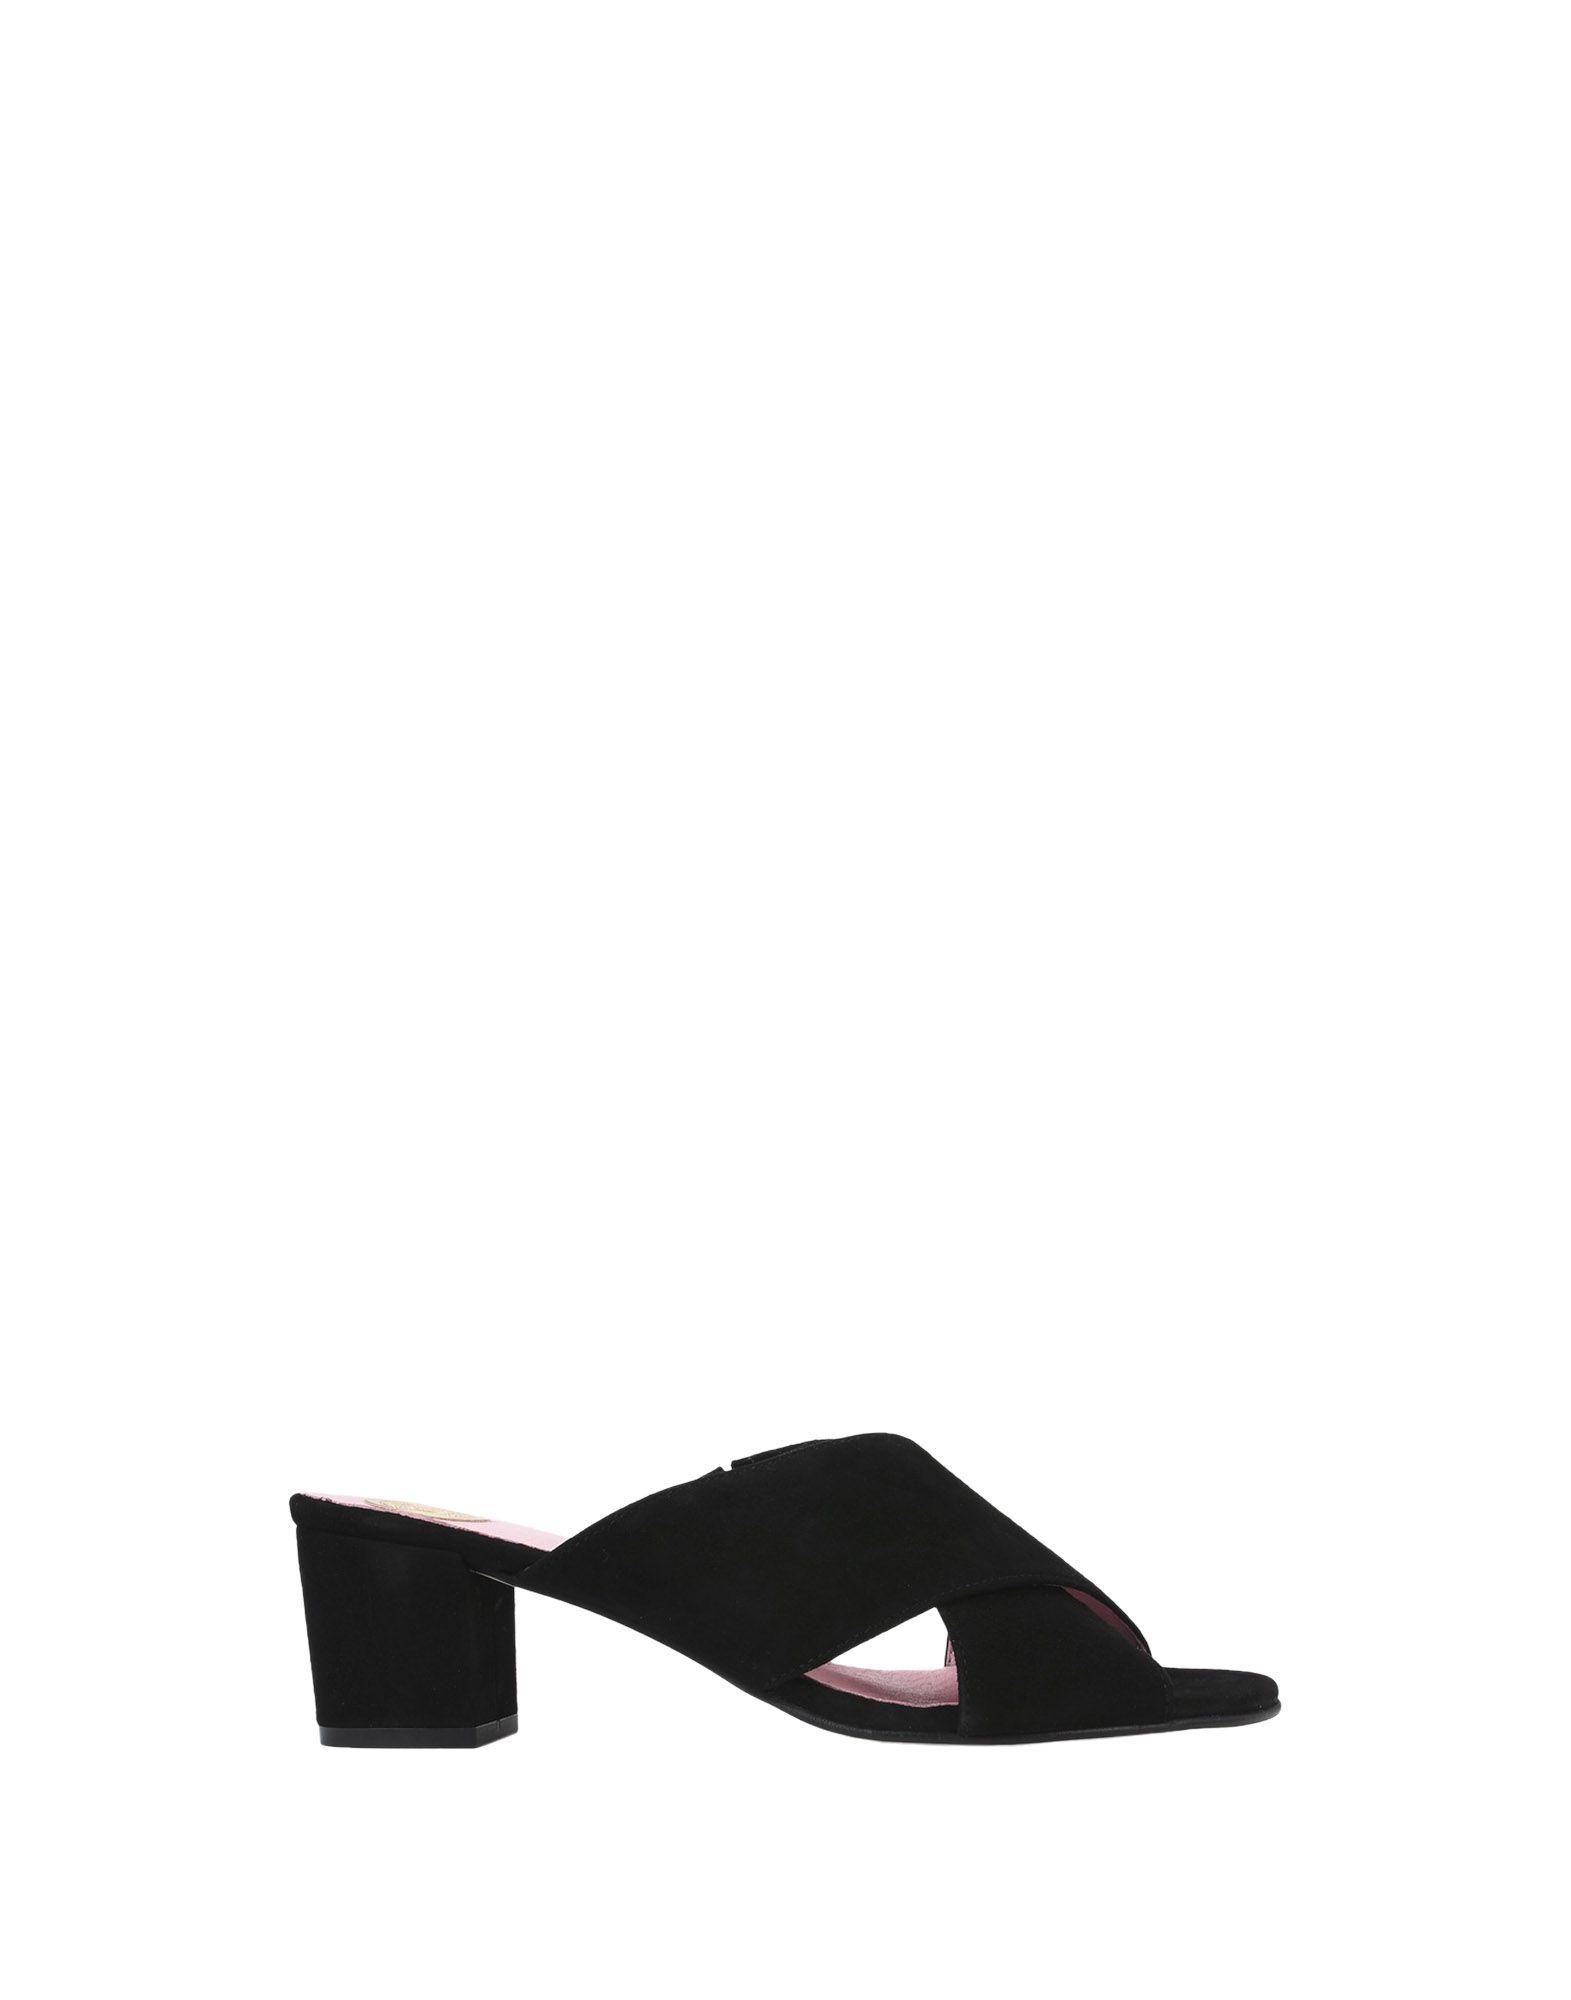 Chaussures - Tribunaux Maison Shoeshibar 6RY5Bd